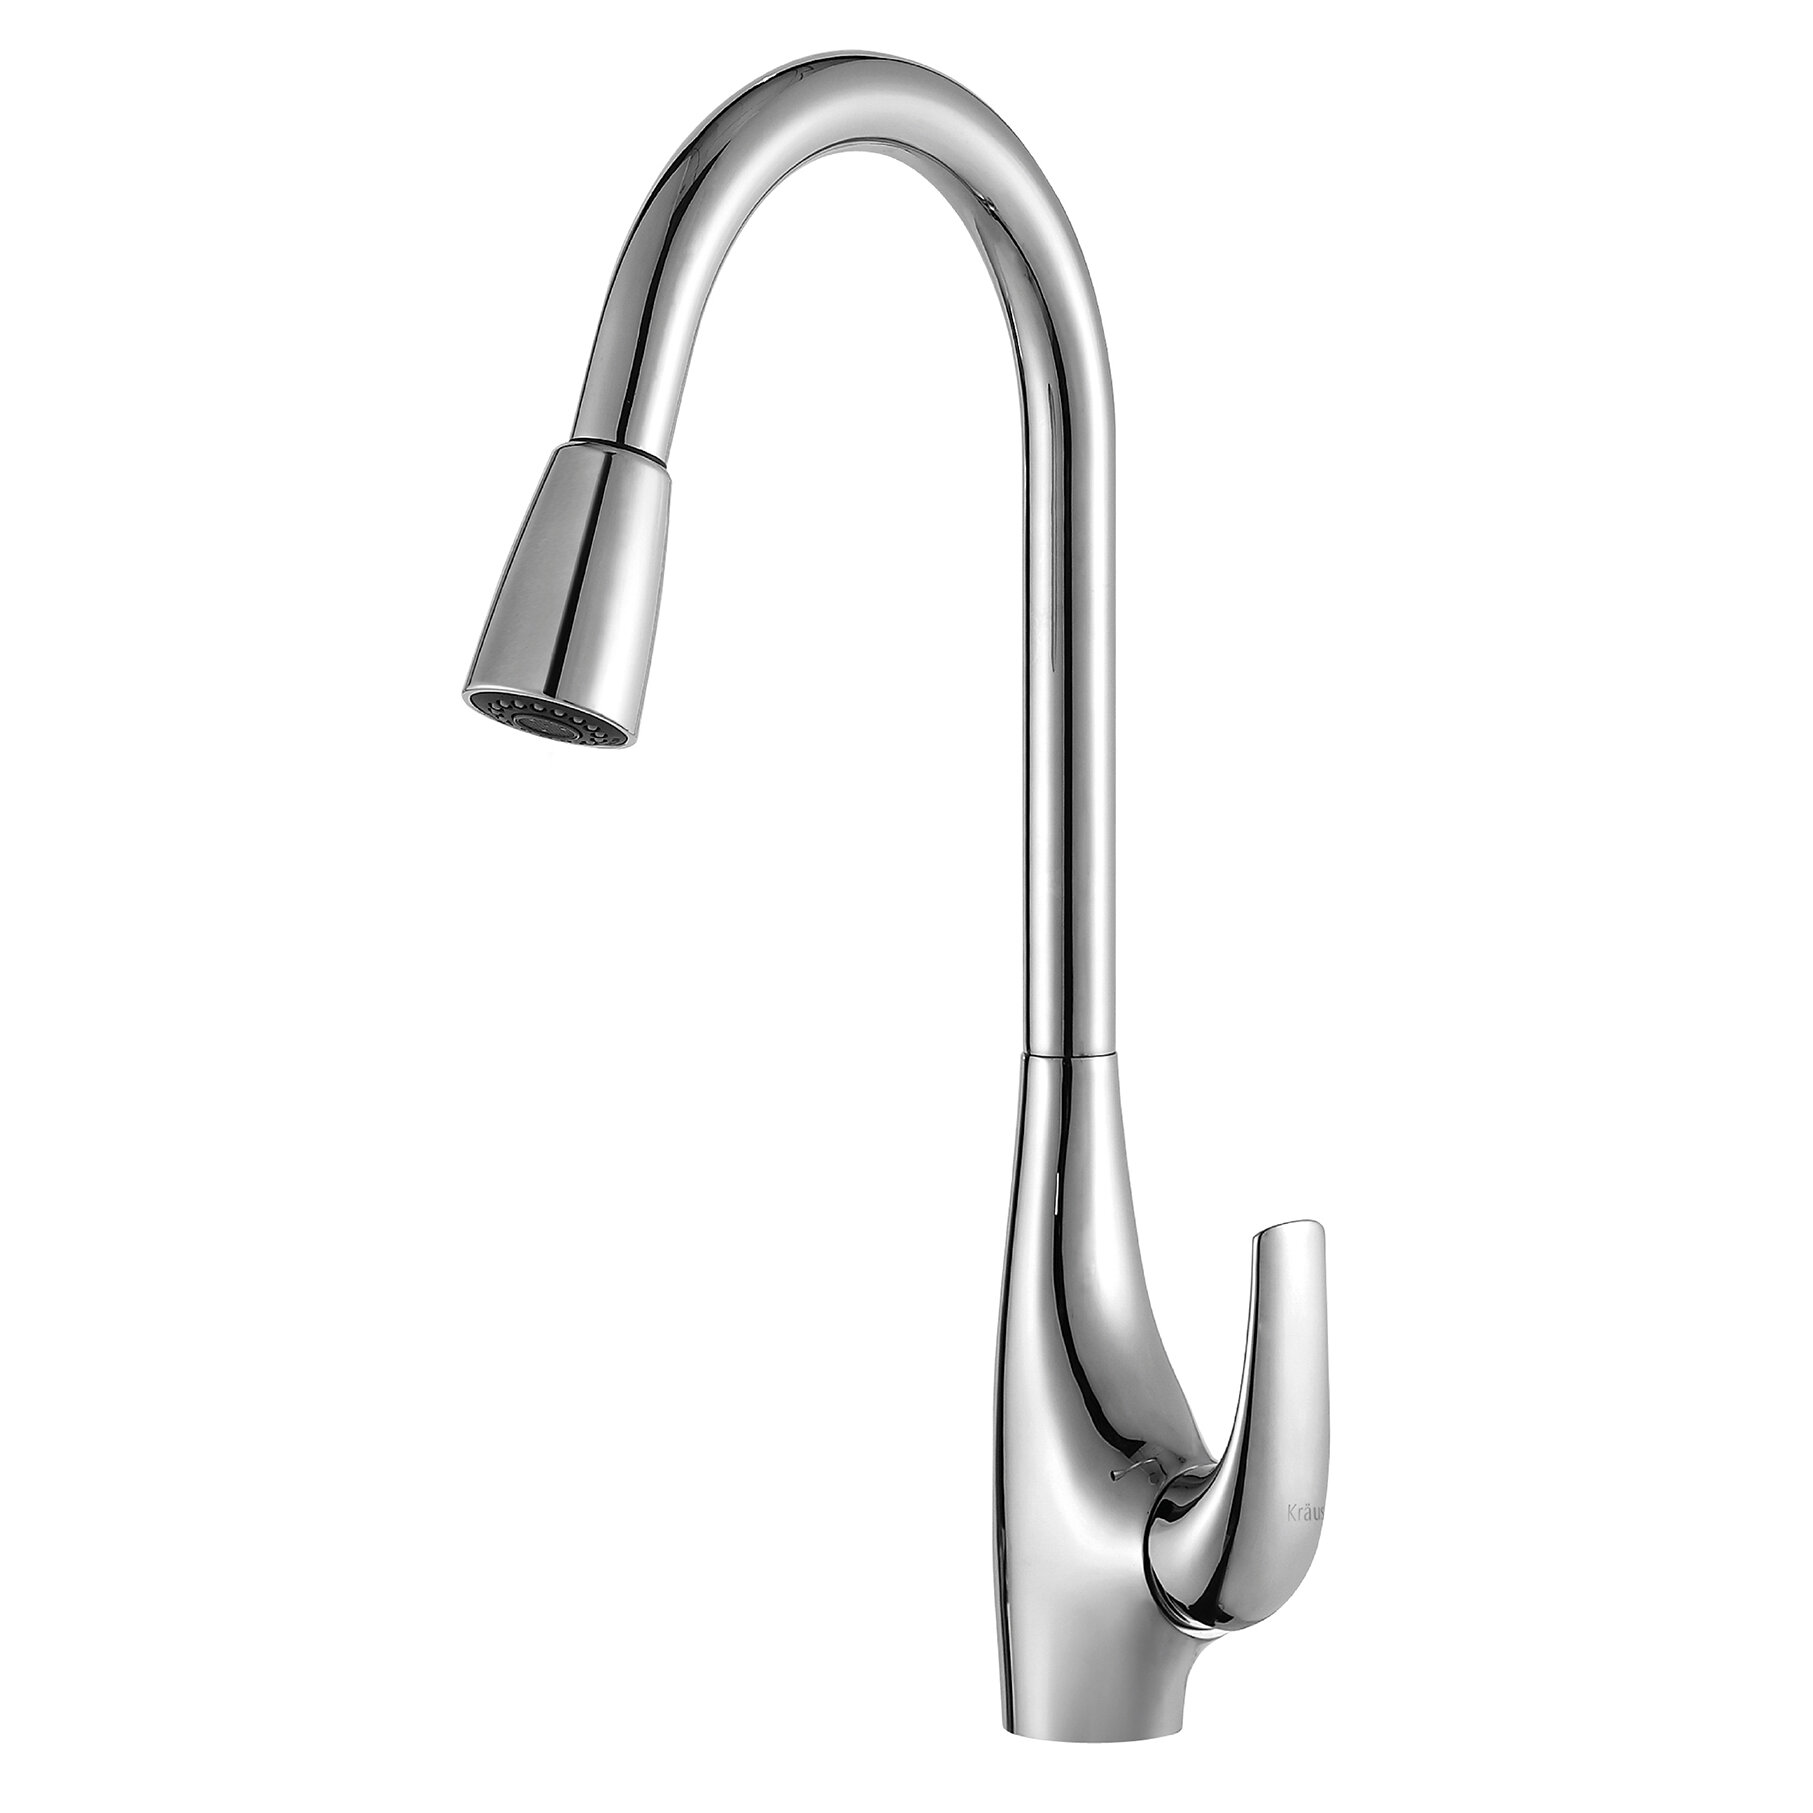 Kraus pull down single handle kitchen faucet reviews wayfair